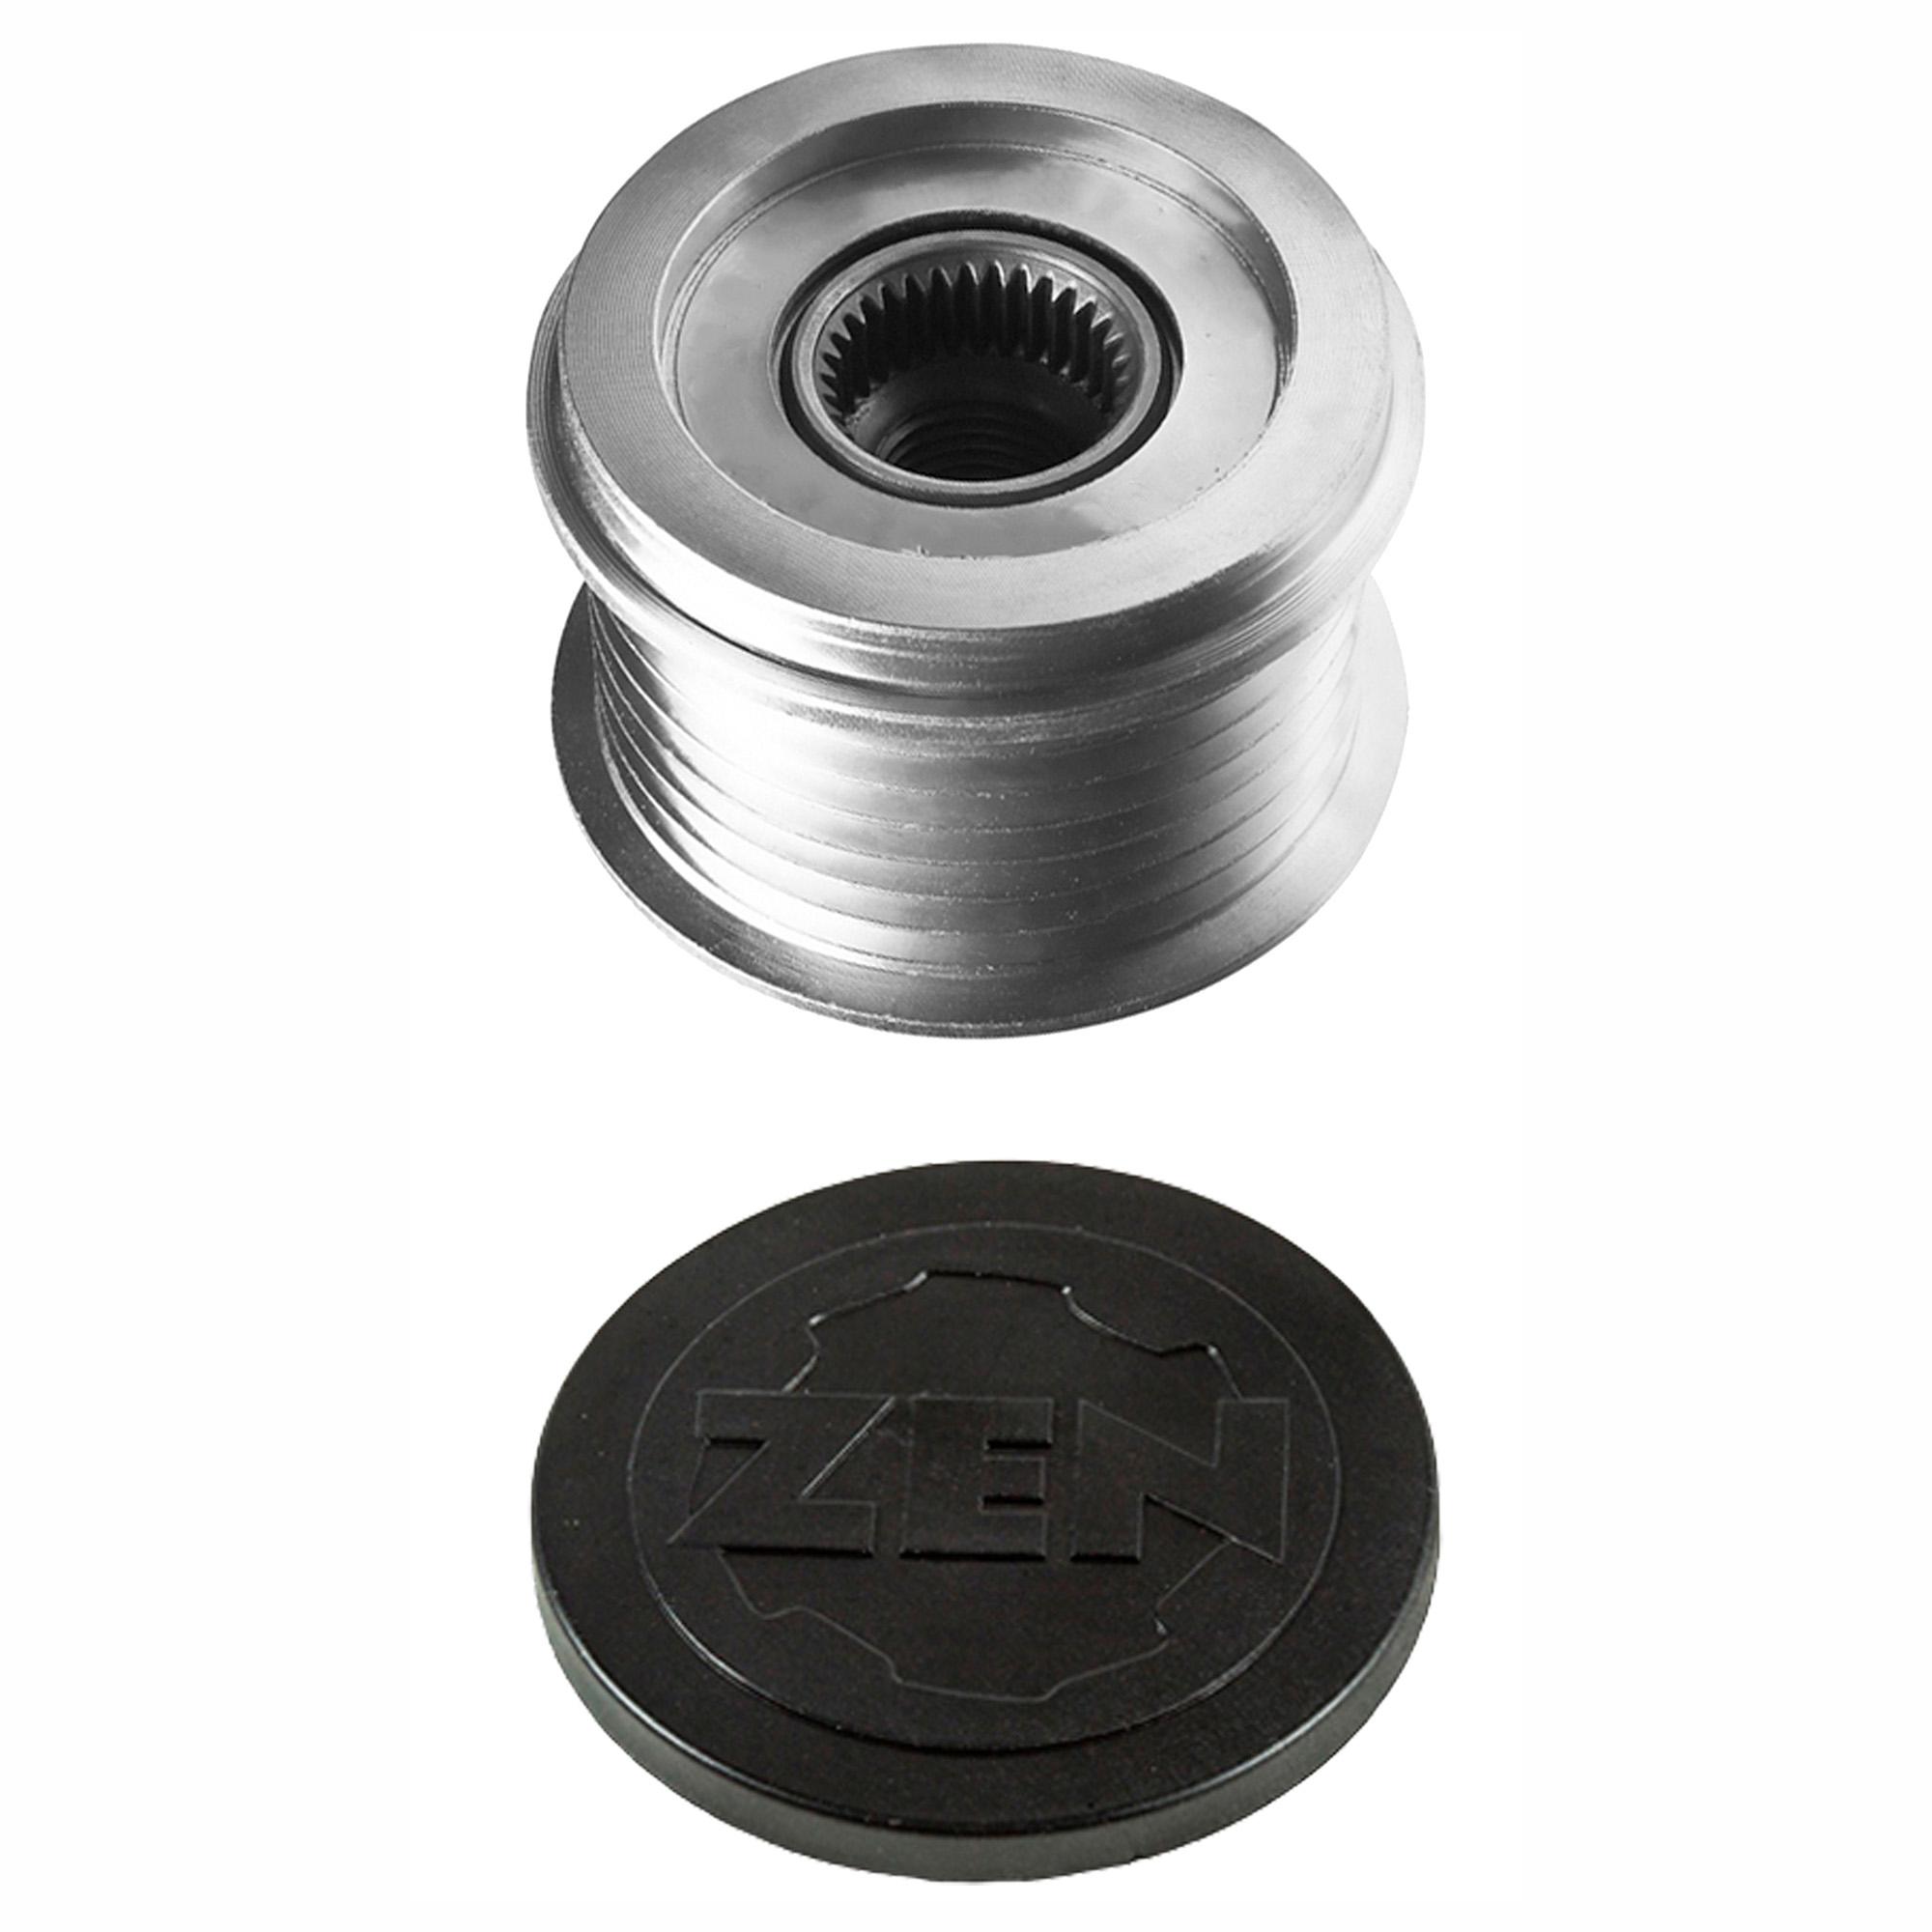 Polia Alternador Roda Livre CAMRY RVA LEXUS (ZEN5503)